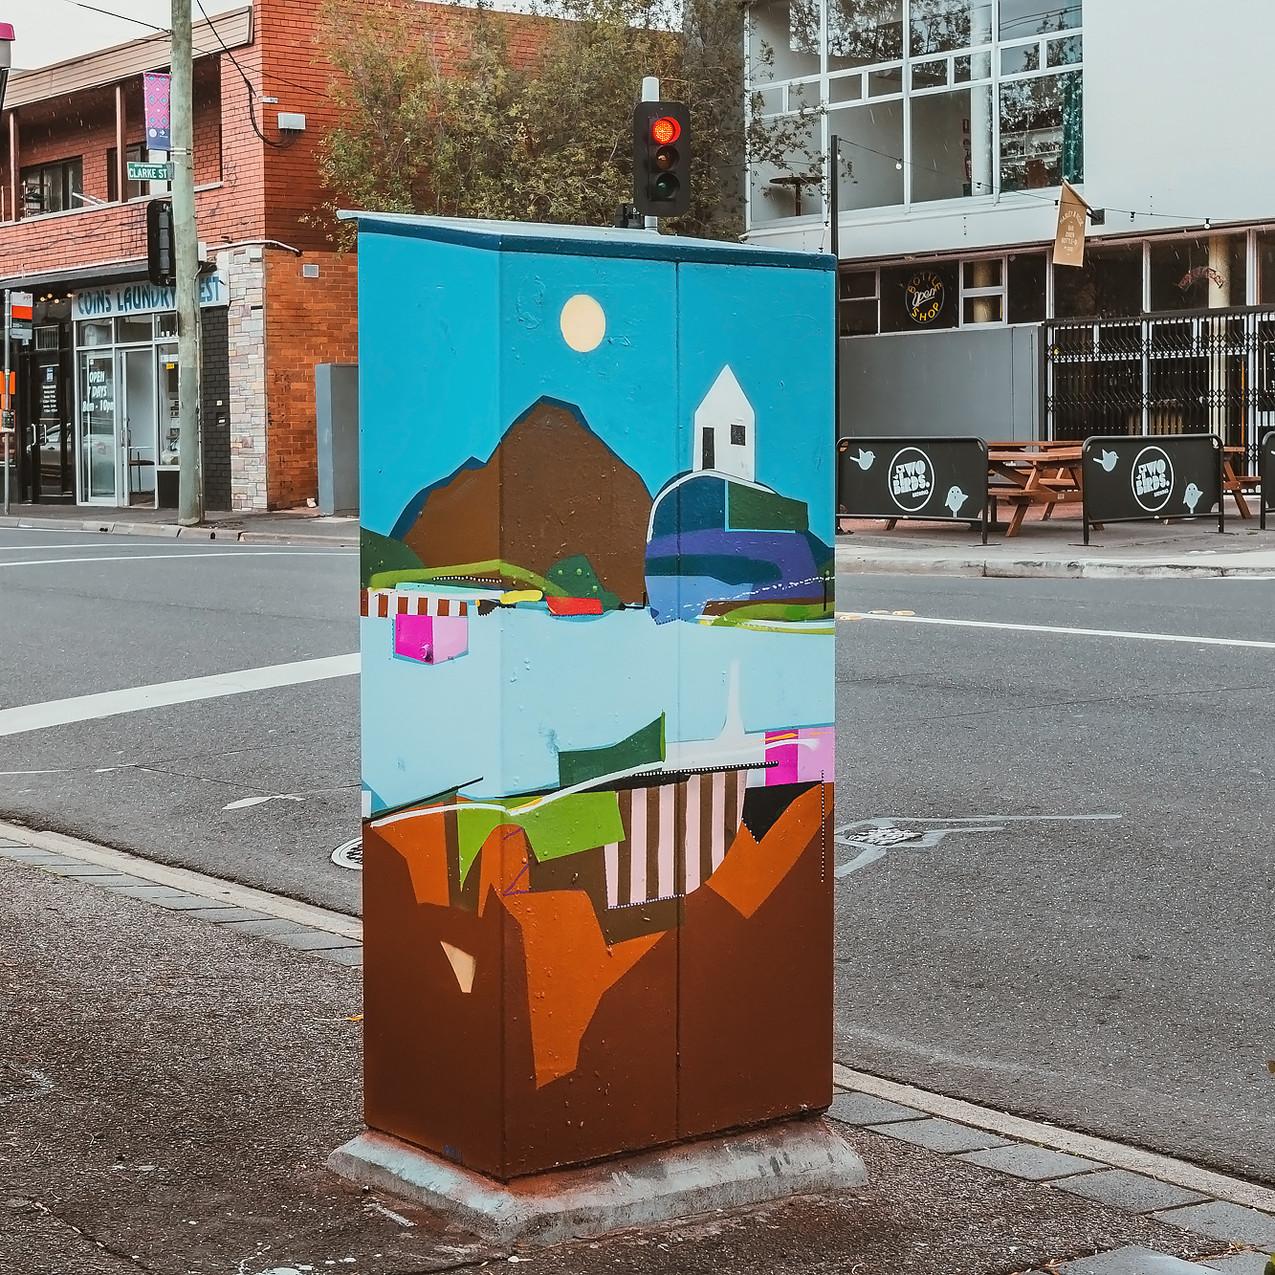 West Footscray Fusebox - A. Doylel